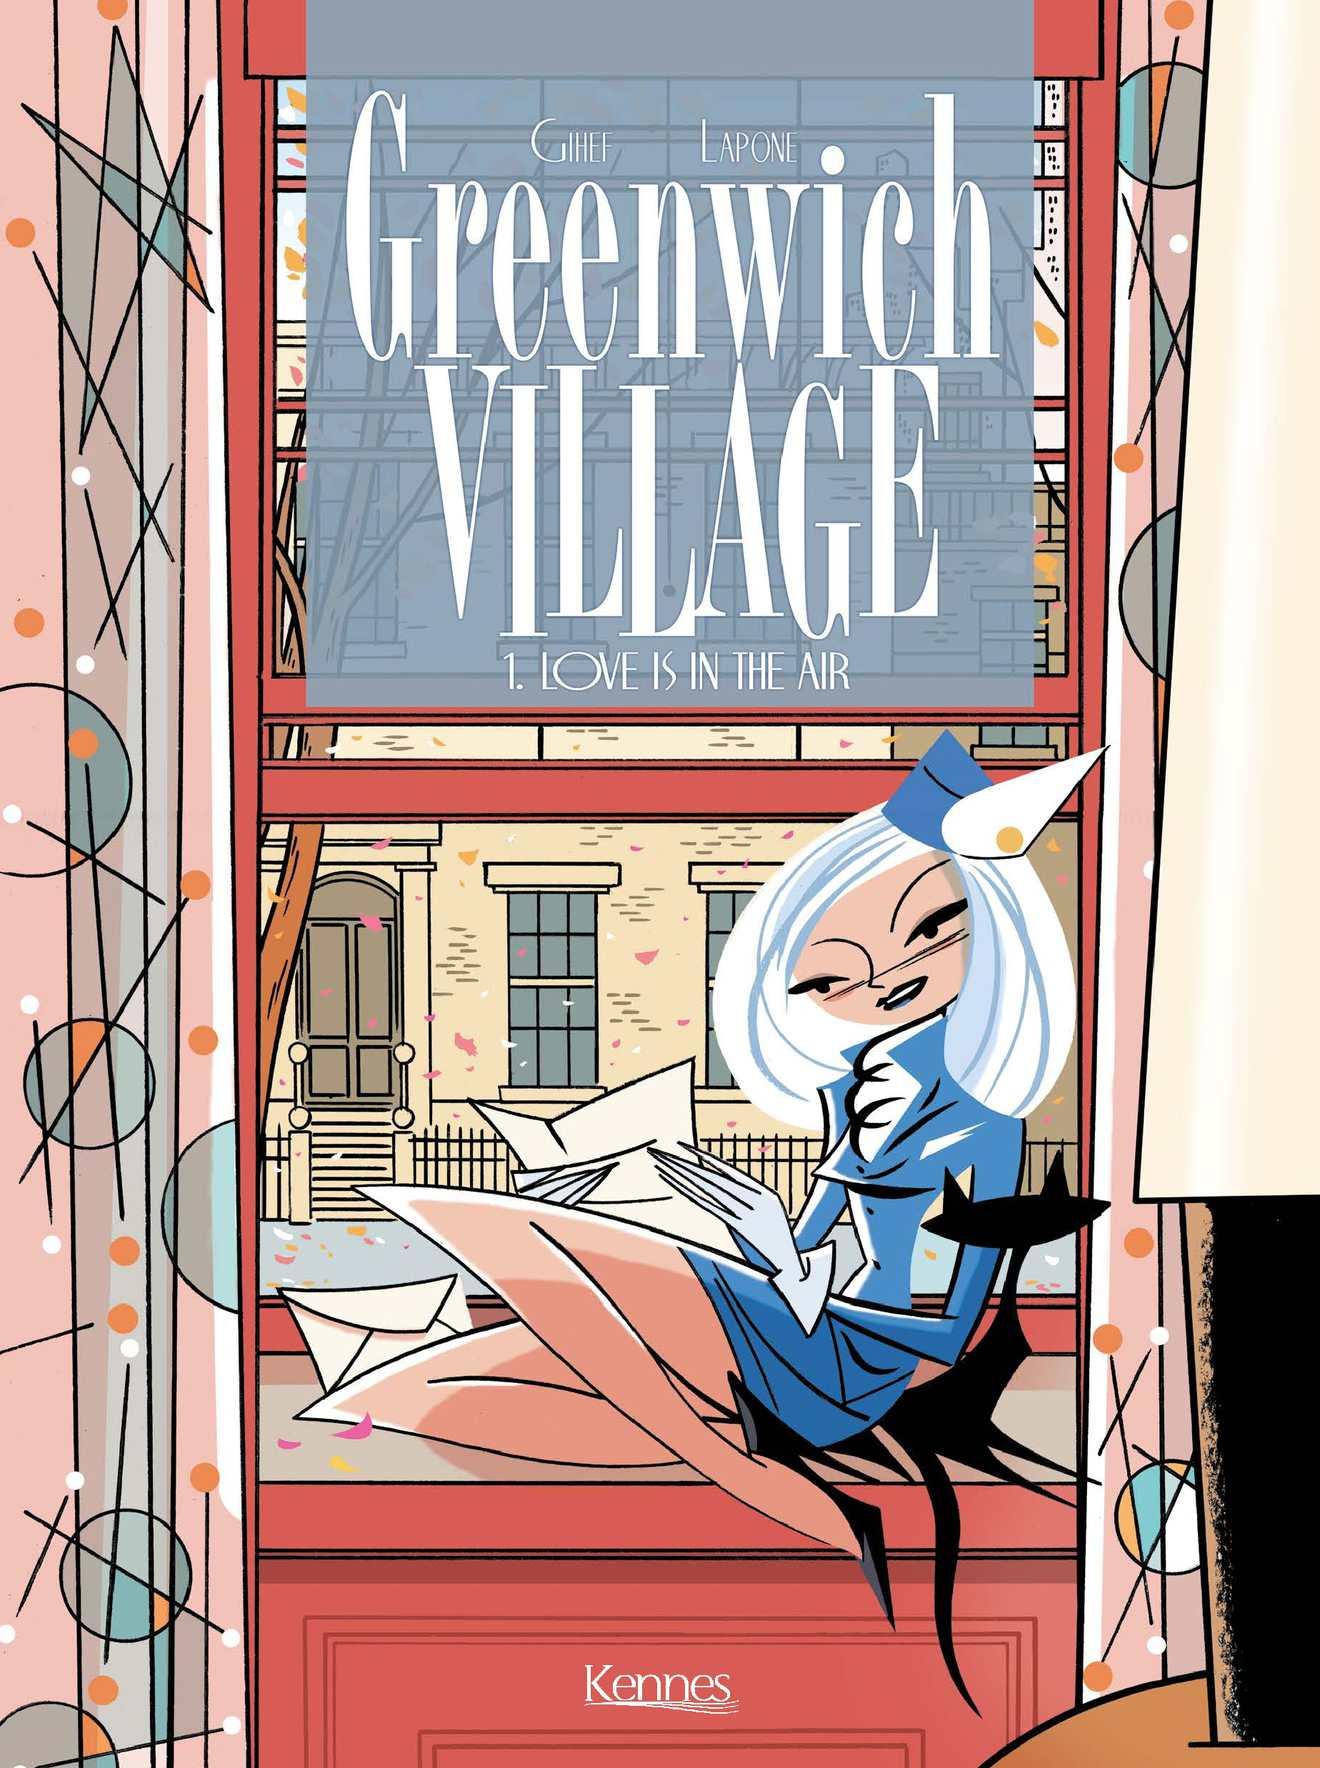 Greenwich Village - Gihef - Antonio Lapone - Couverture